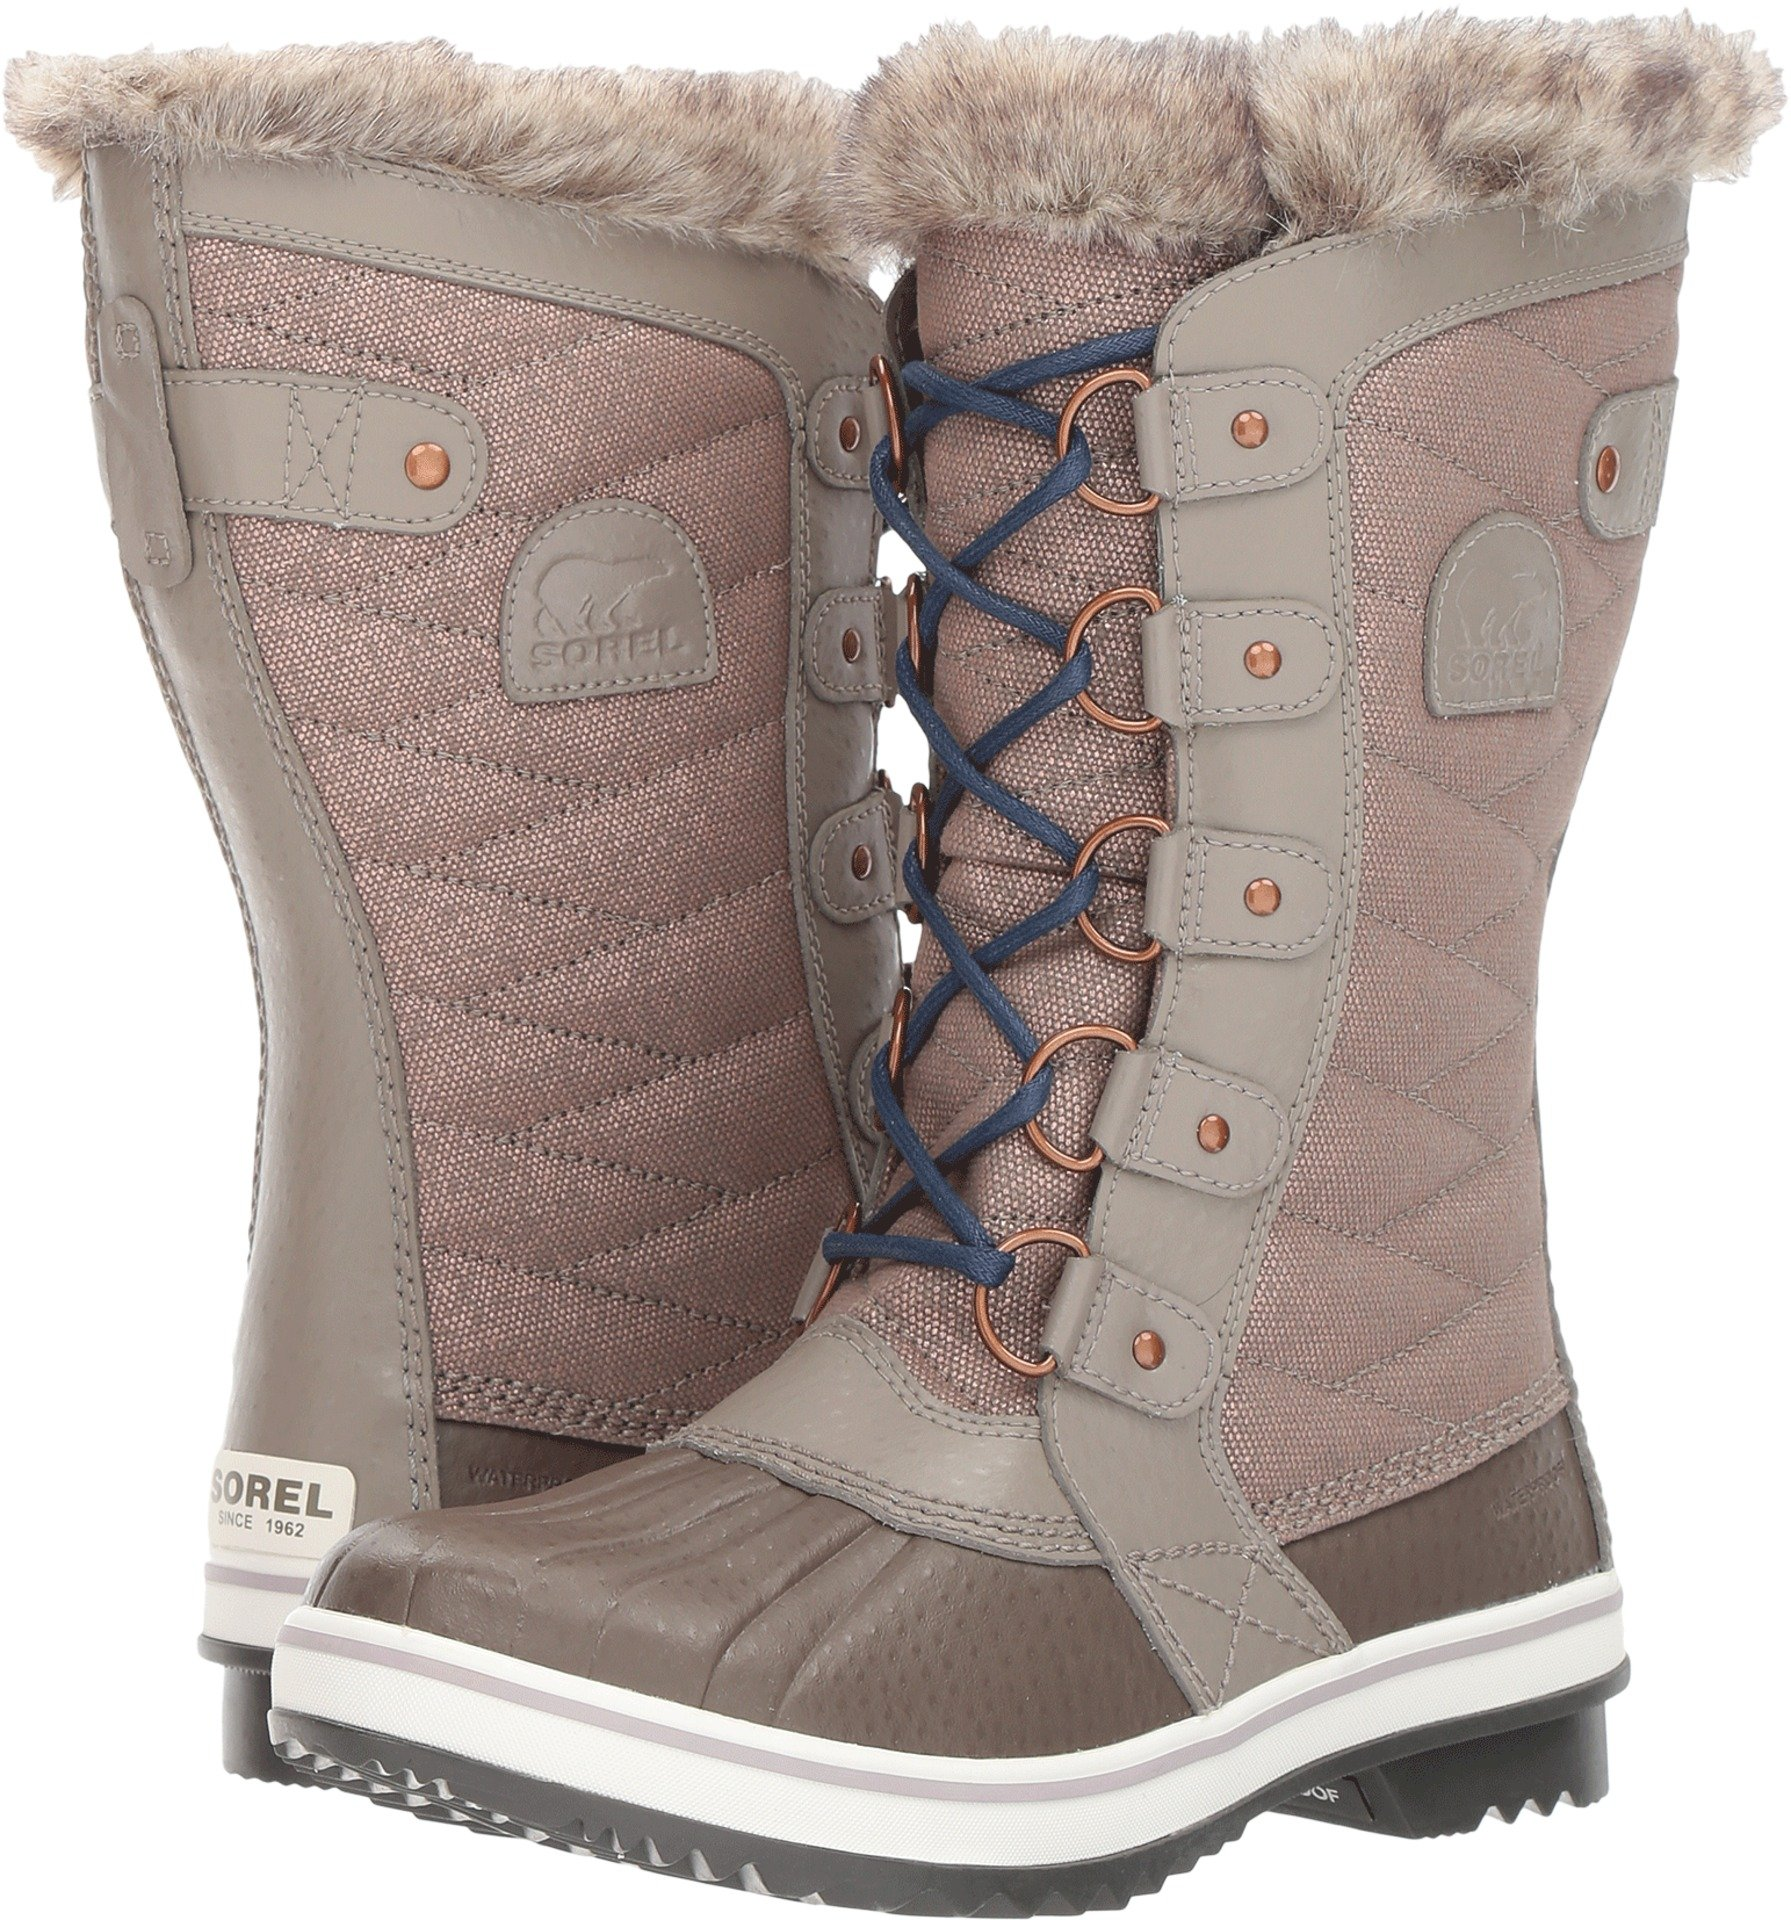 Sorel Tofino II Boot - Women's Kettle/Dusk, 11.0